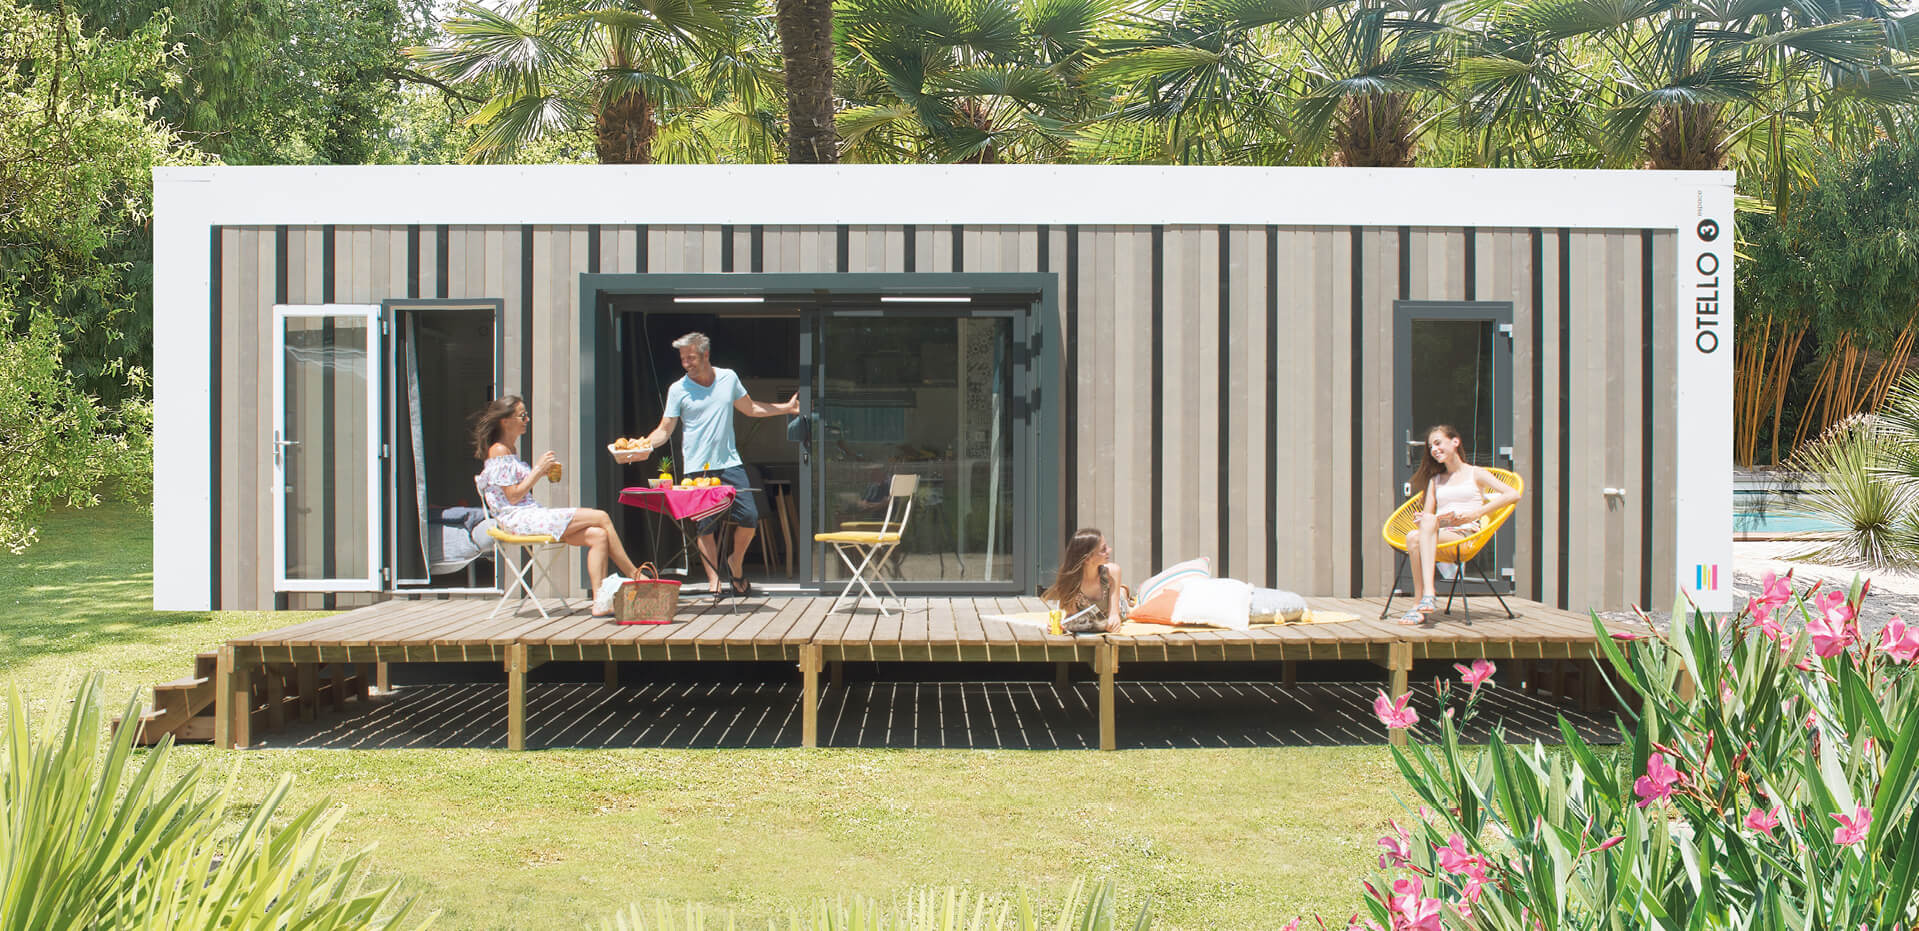 fabricant de mobil home constructeur fran ais mobil home rideau. Black Bedroom Furniture Sets. Home Design Ideas